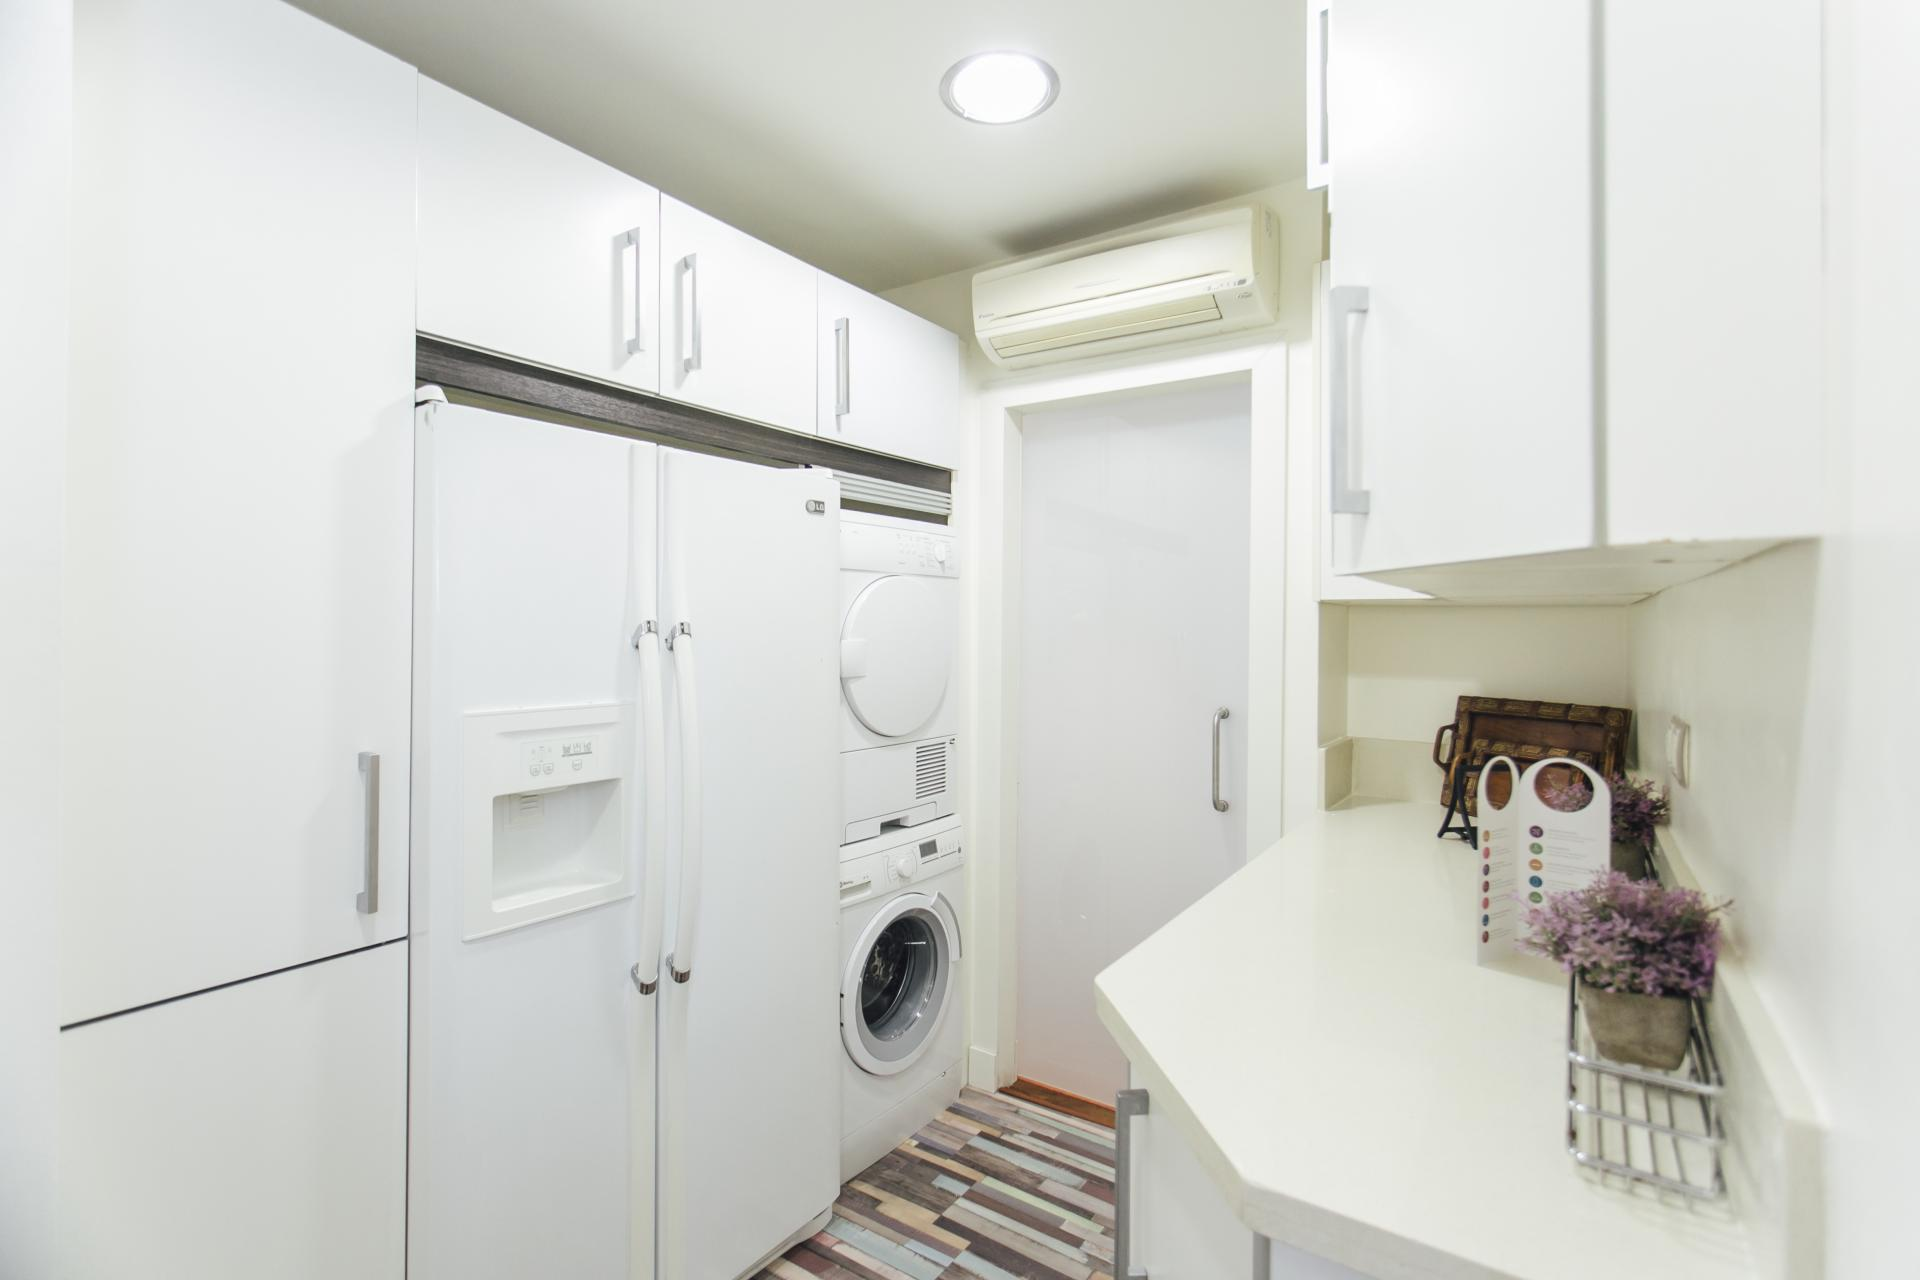 Laundry facilities at Arjona Apartment, Centre, Seville